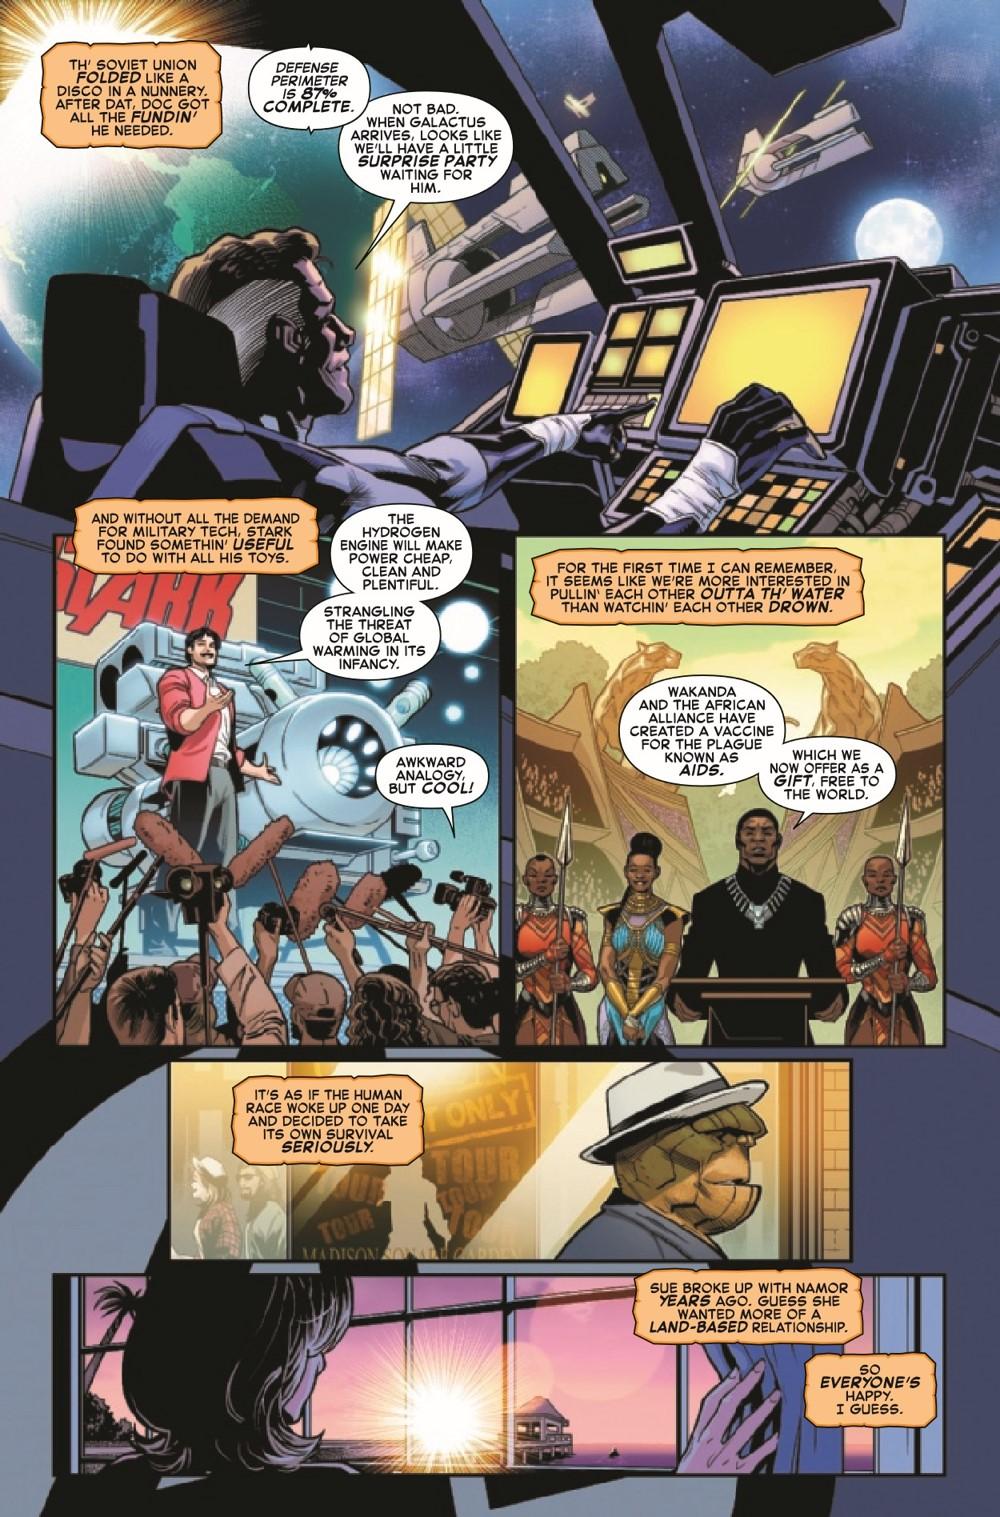 FFLIFESTORY2019004_Preview-4 ComicList Previews: FANTASTIC FOUR LIFE STORY #4 (OF 6)